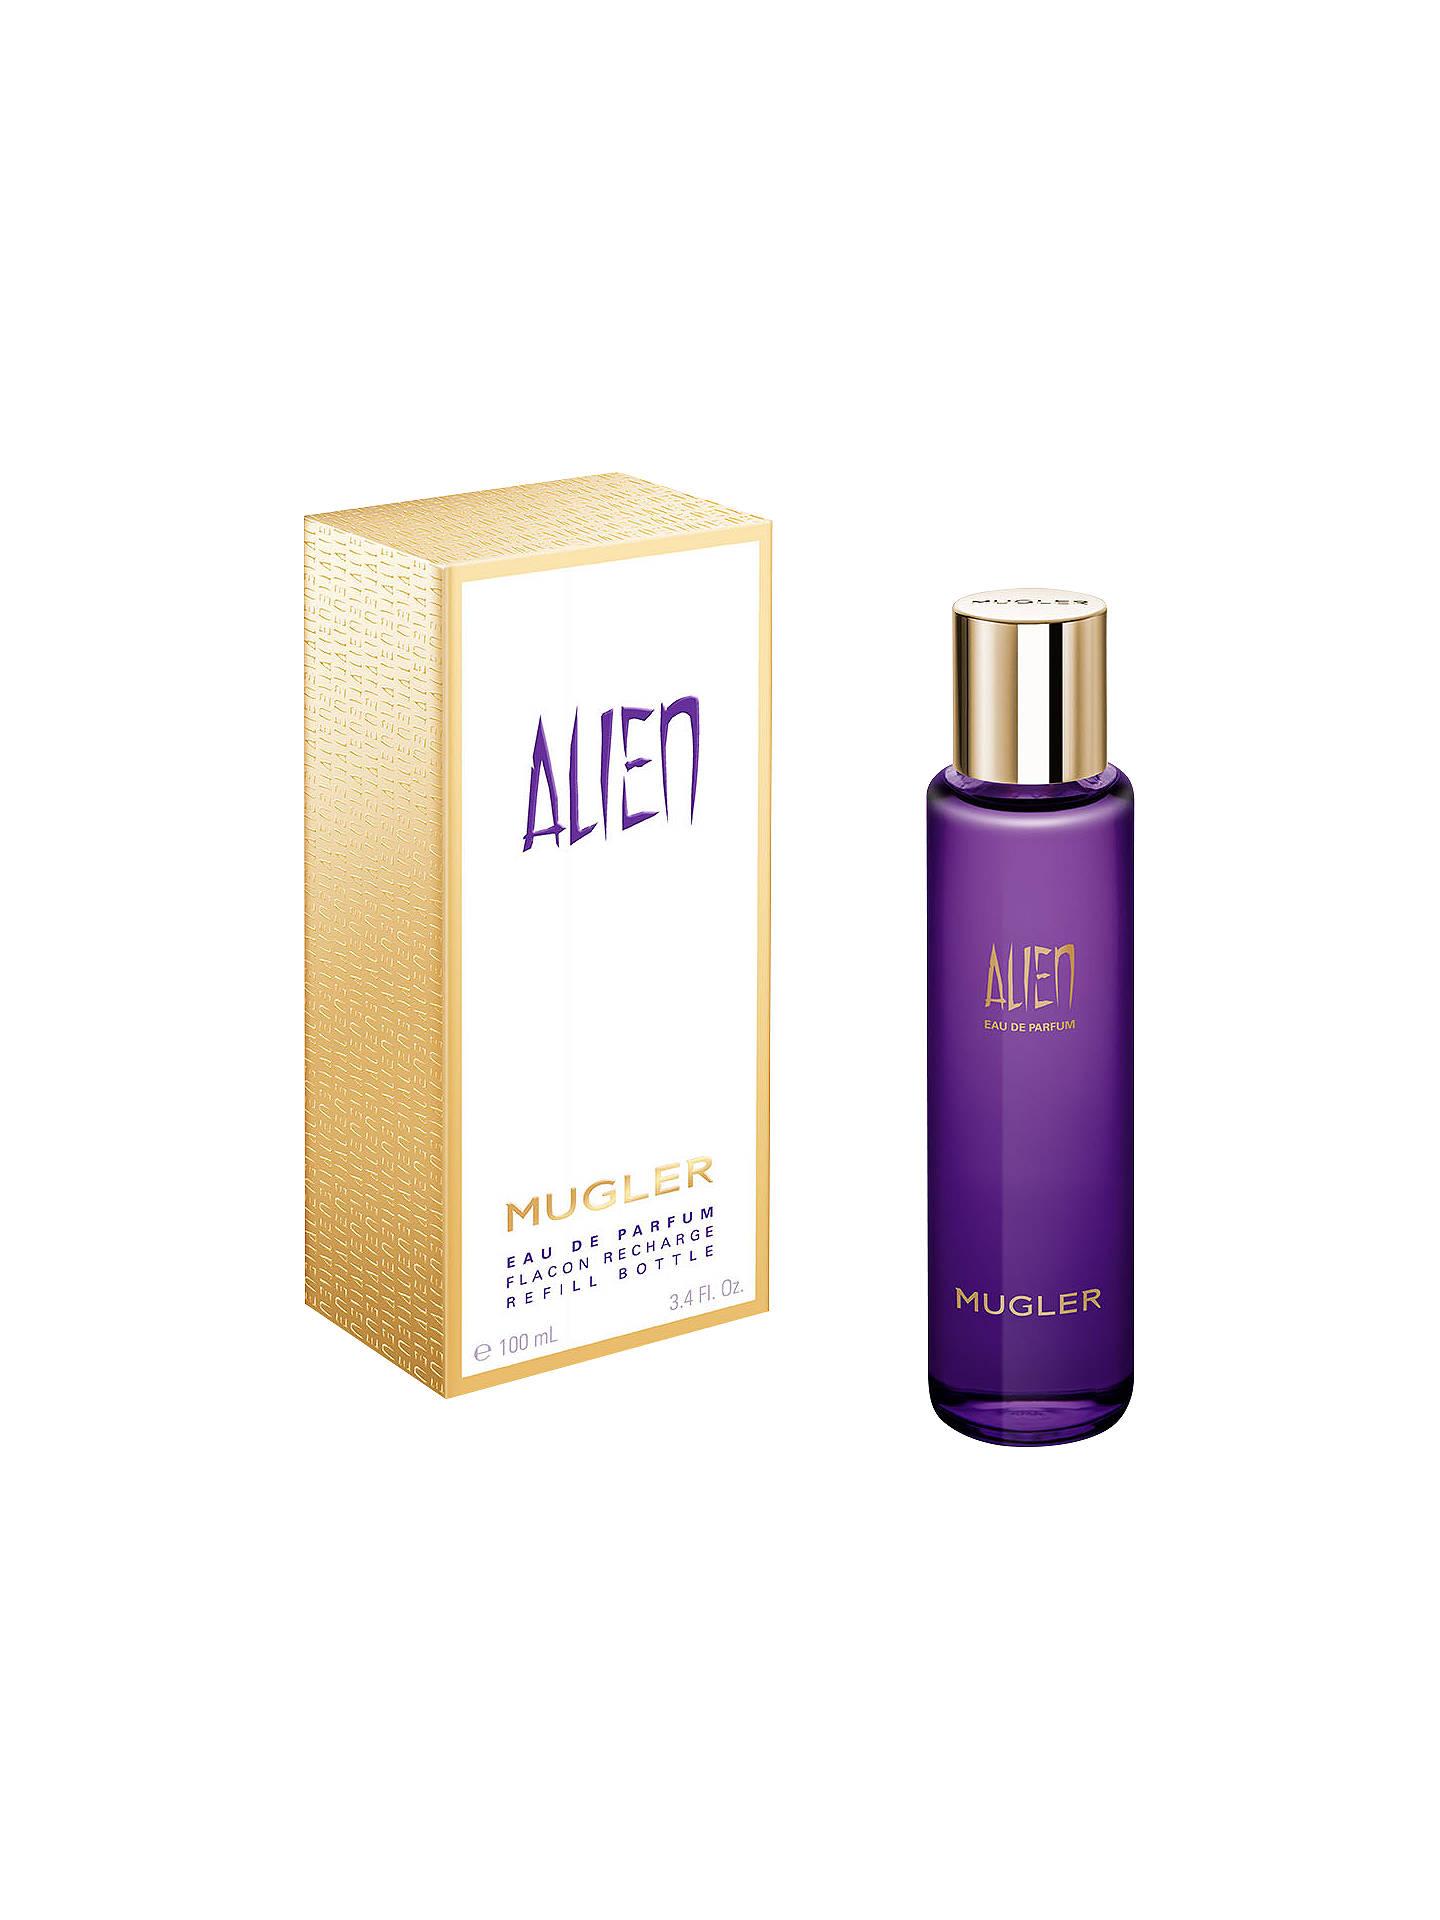 Mugler Alien Eau De Parfum Eco Refill Bottle 100ml At John Lewis